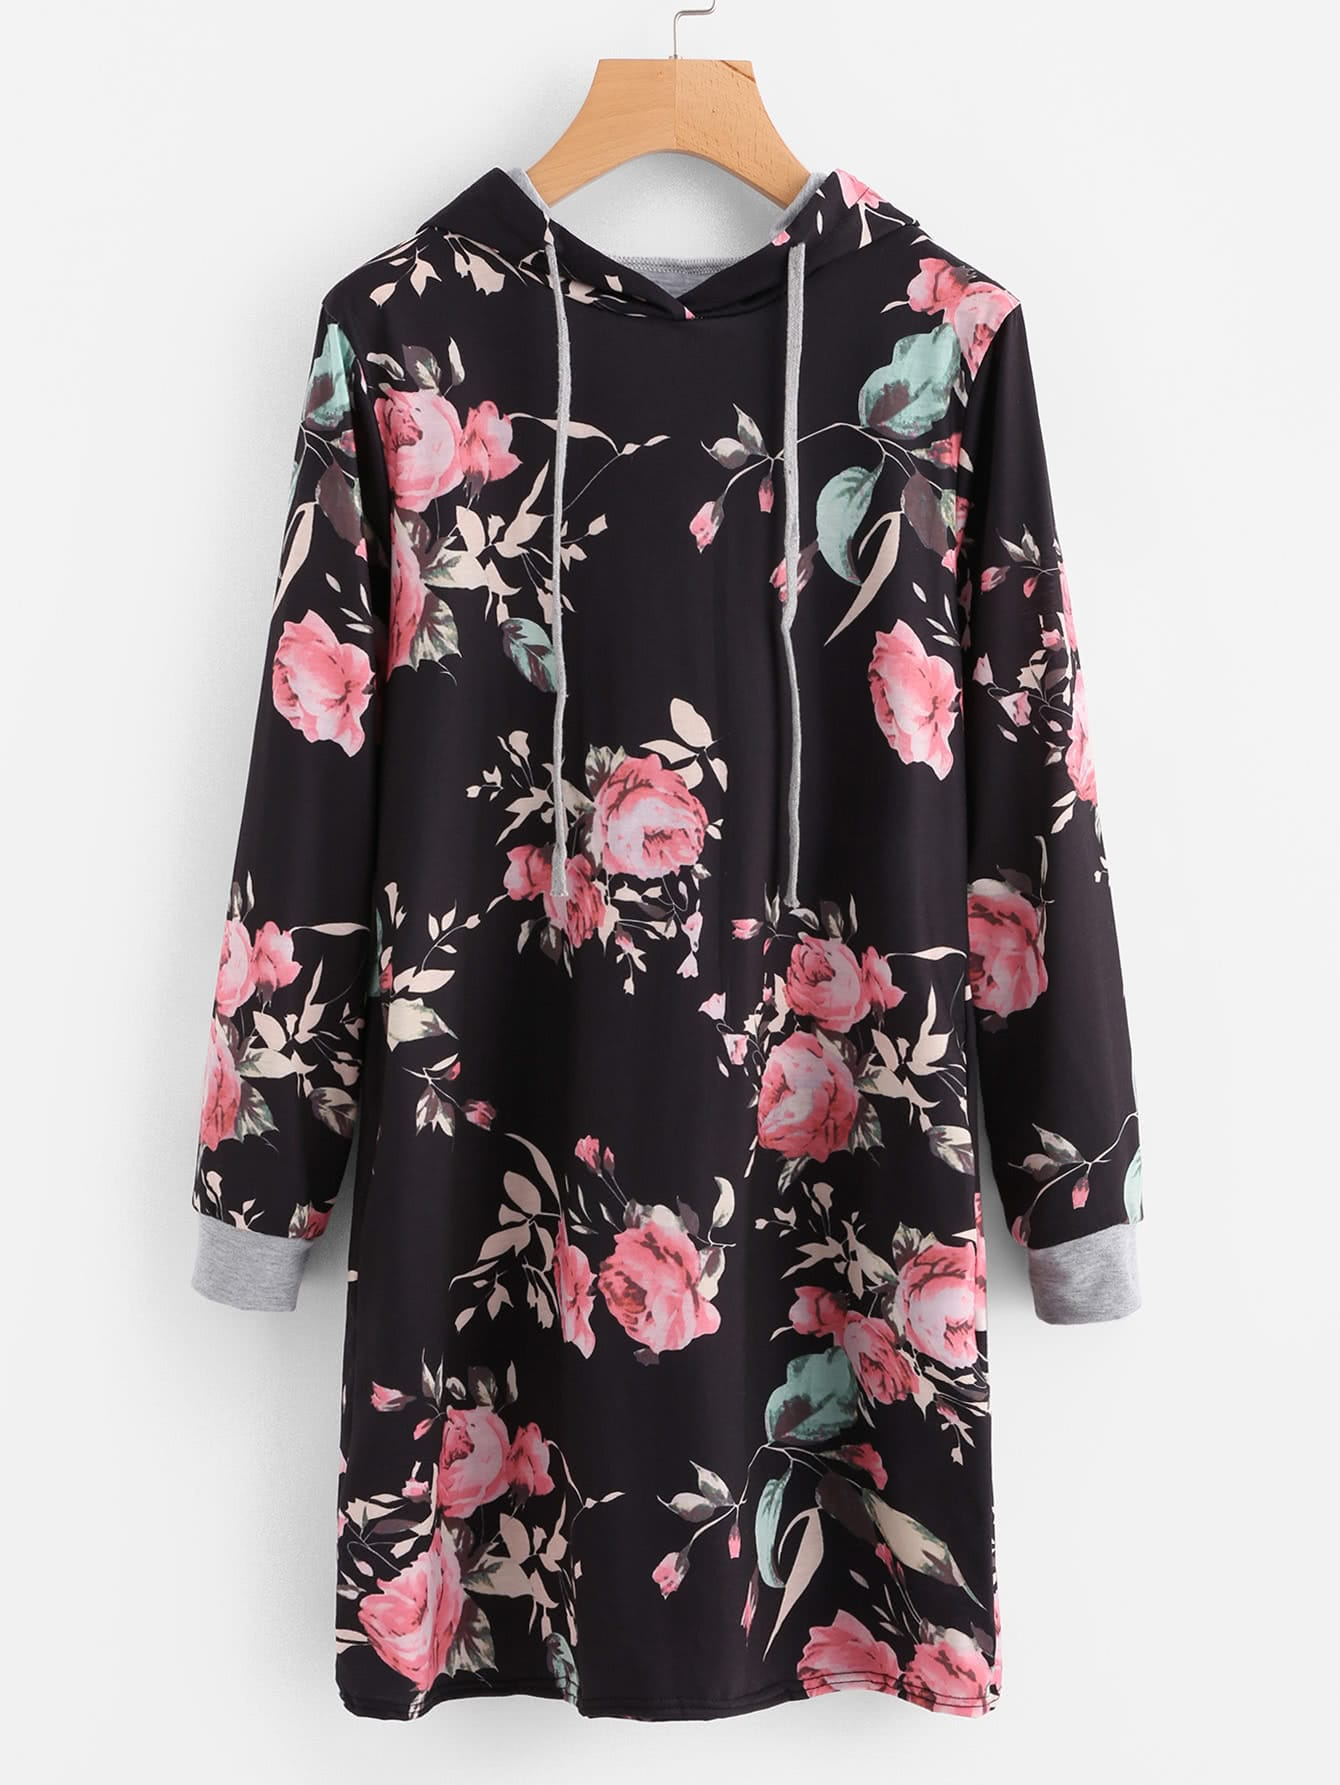 Hooded Floral Print Sweatshirt Dress plus size letter print hooded sweatshirt dress